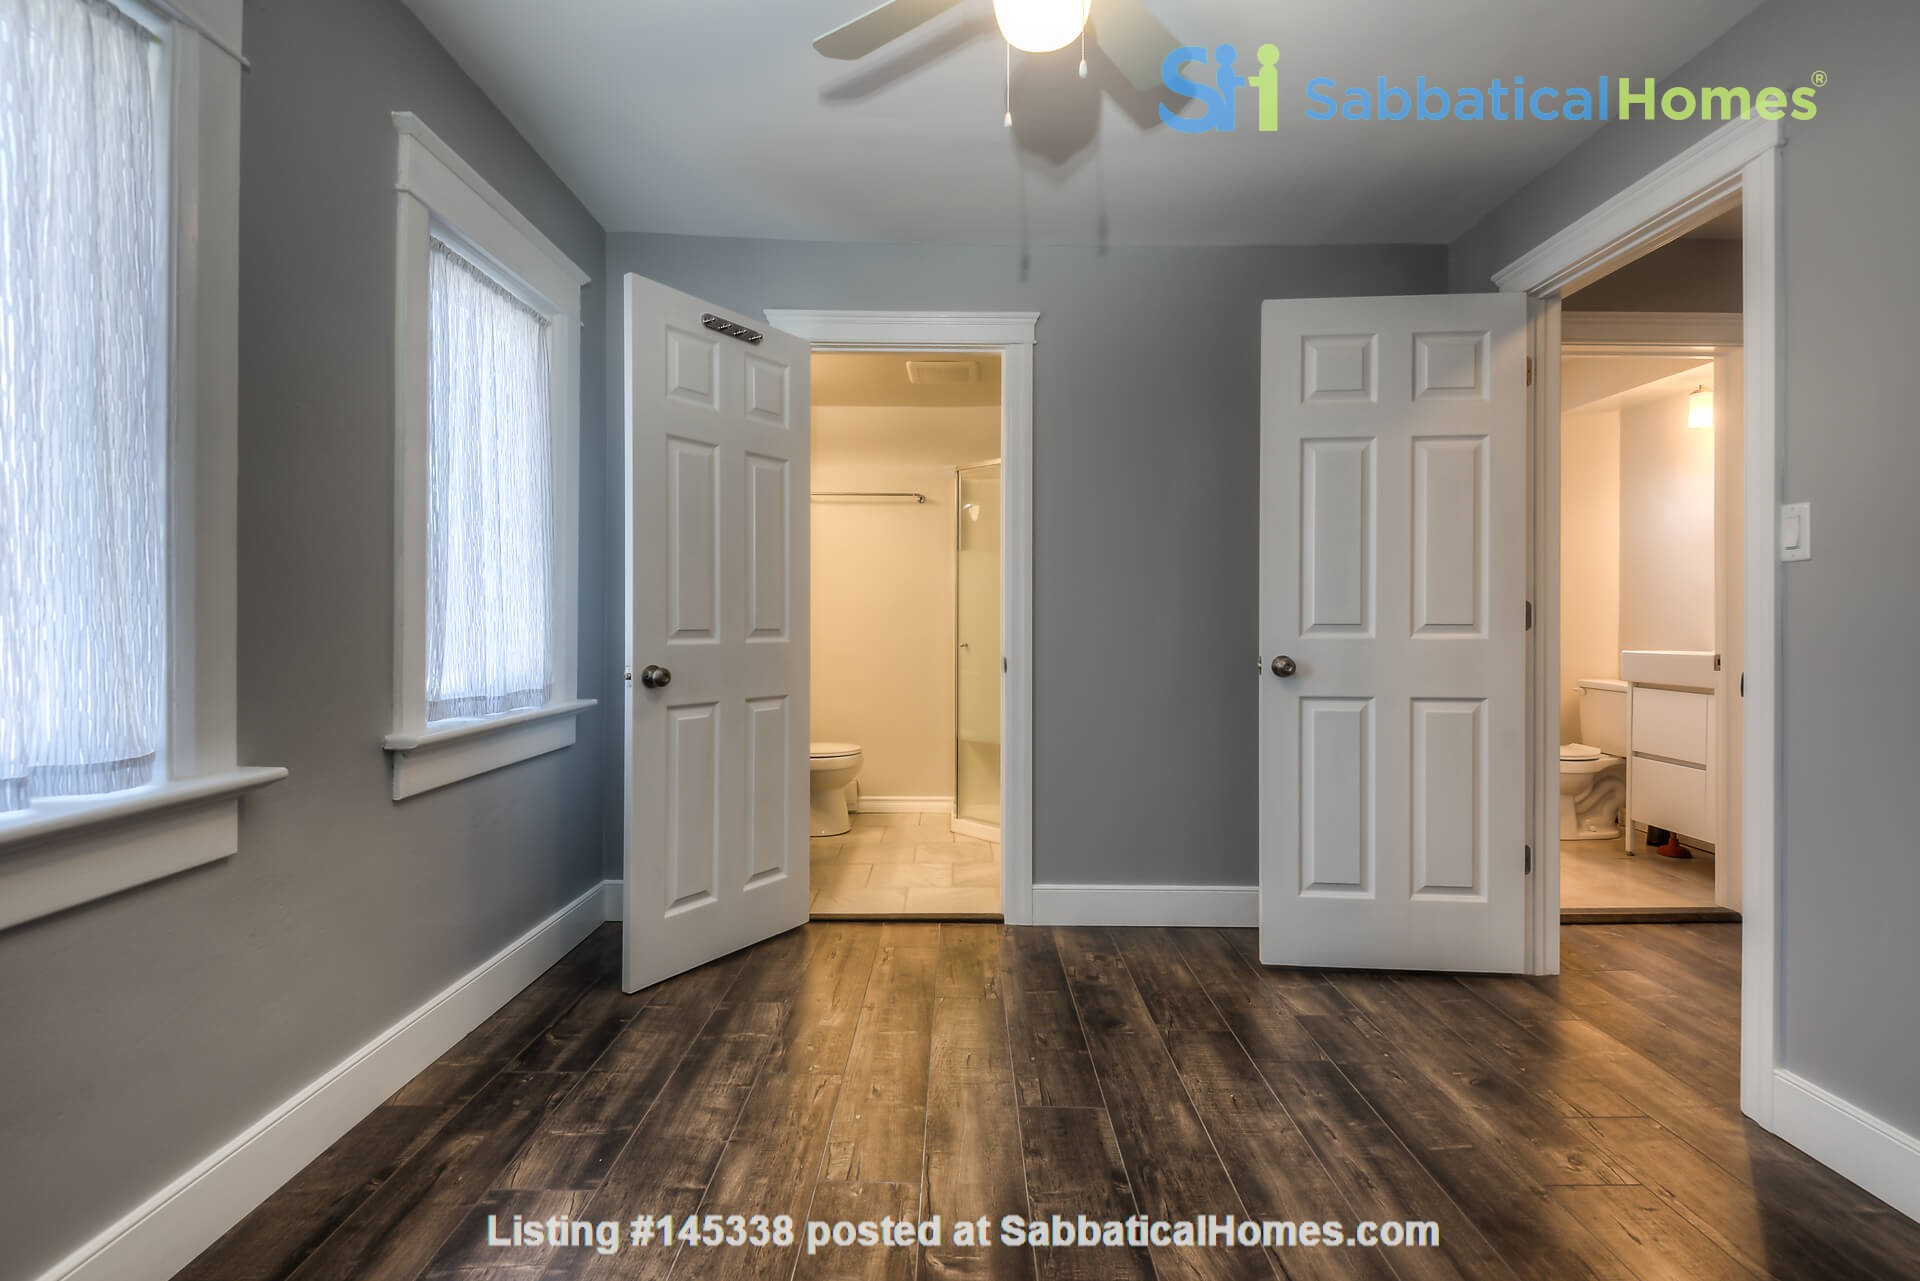 3 bdrm home (unfurnished) - downtown Kitchener-Waterloo Home Rental in Kitchener, Ontario, Canada 4